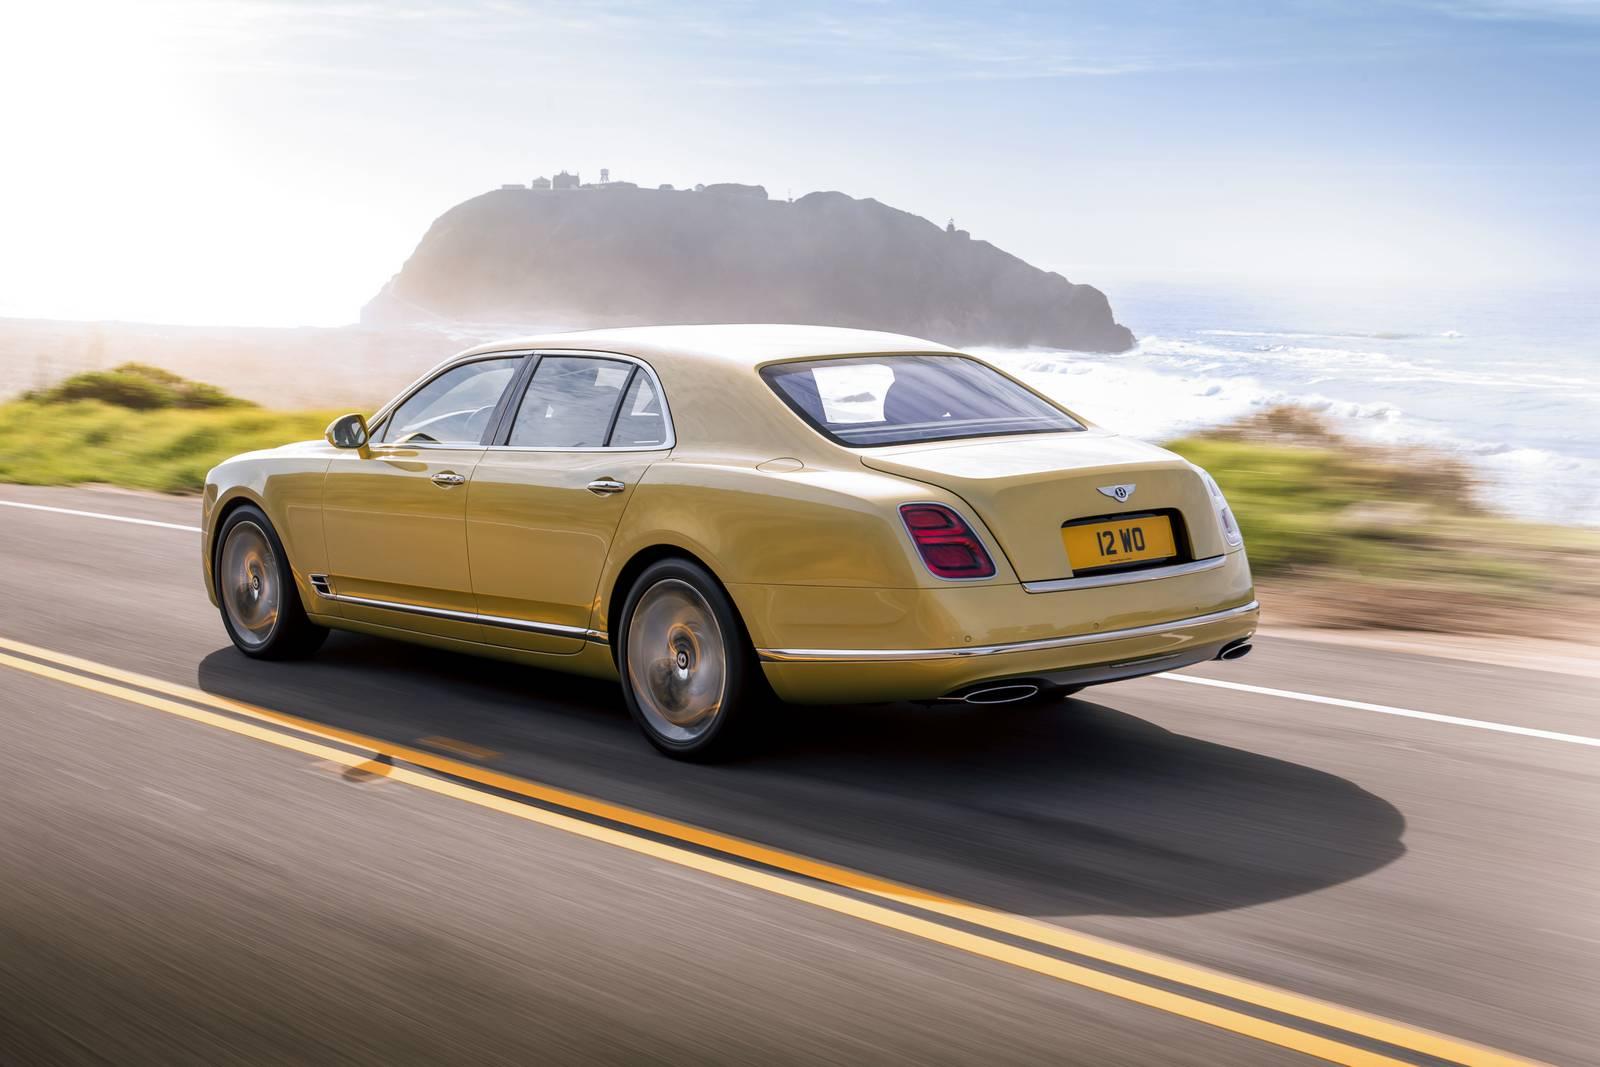 La Bentley Mulsanne, innovation et artisanat